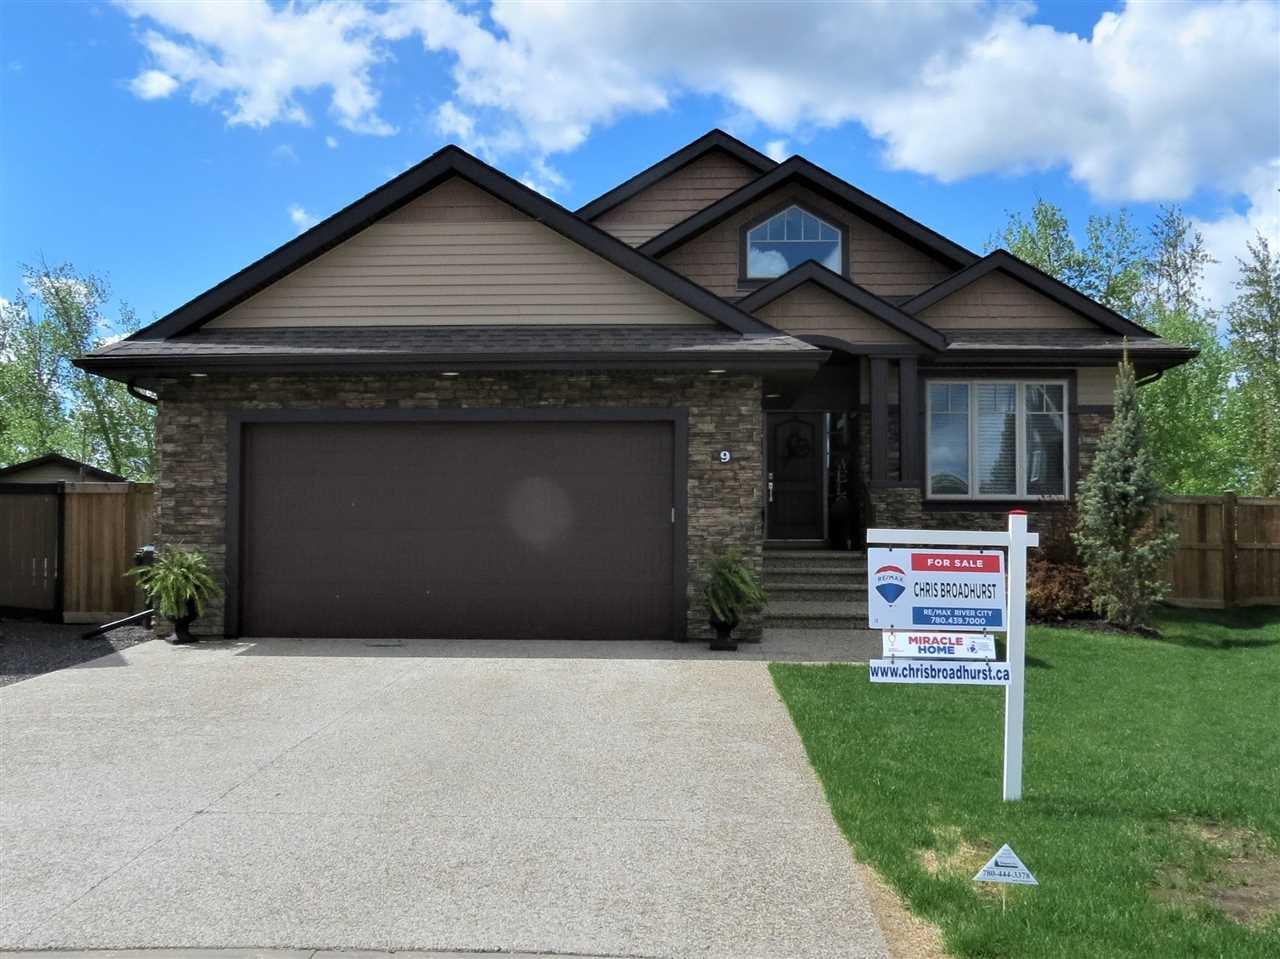 Main Photo: 9 ASPENGLEN Cove: Spruce Grove House for sale : MLS®# E4195175